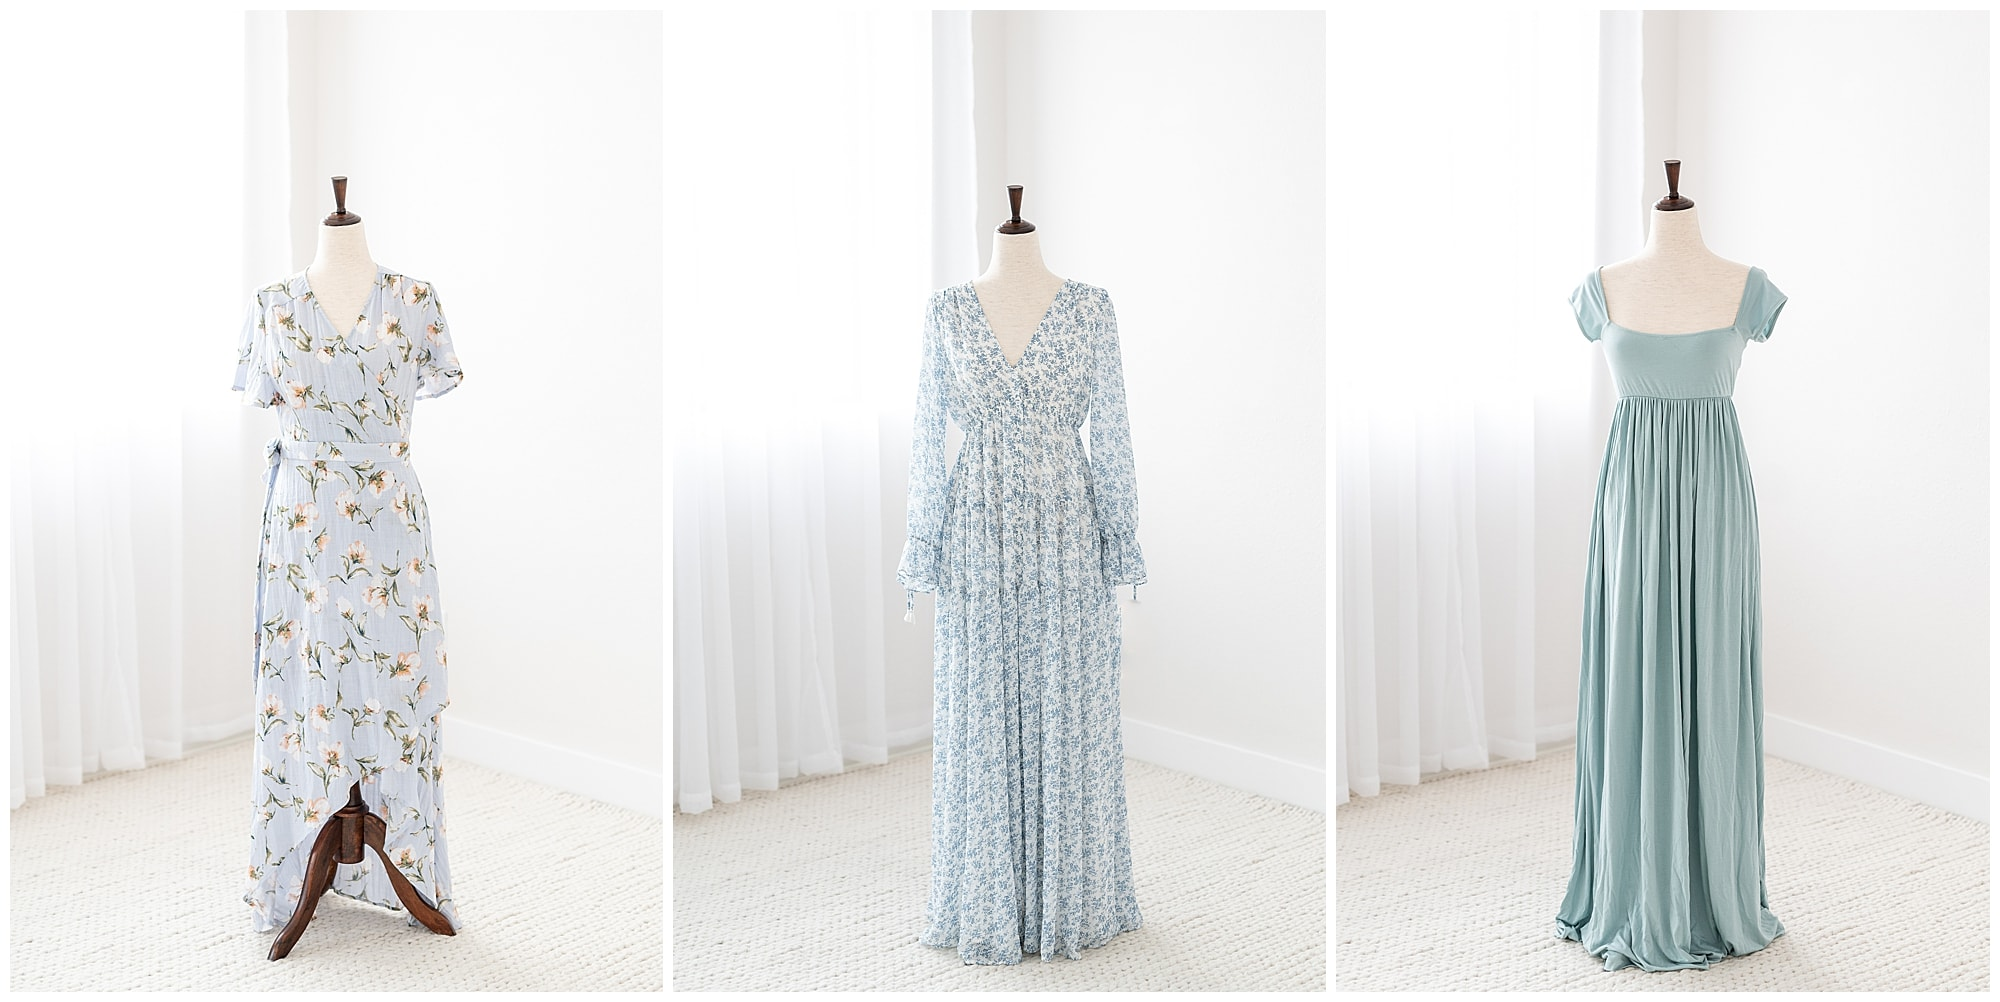 Frisco Newborn Photographer Studio Wardrobe Options